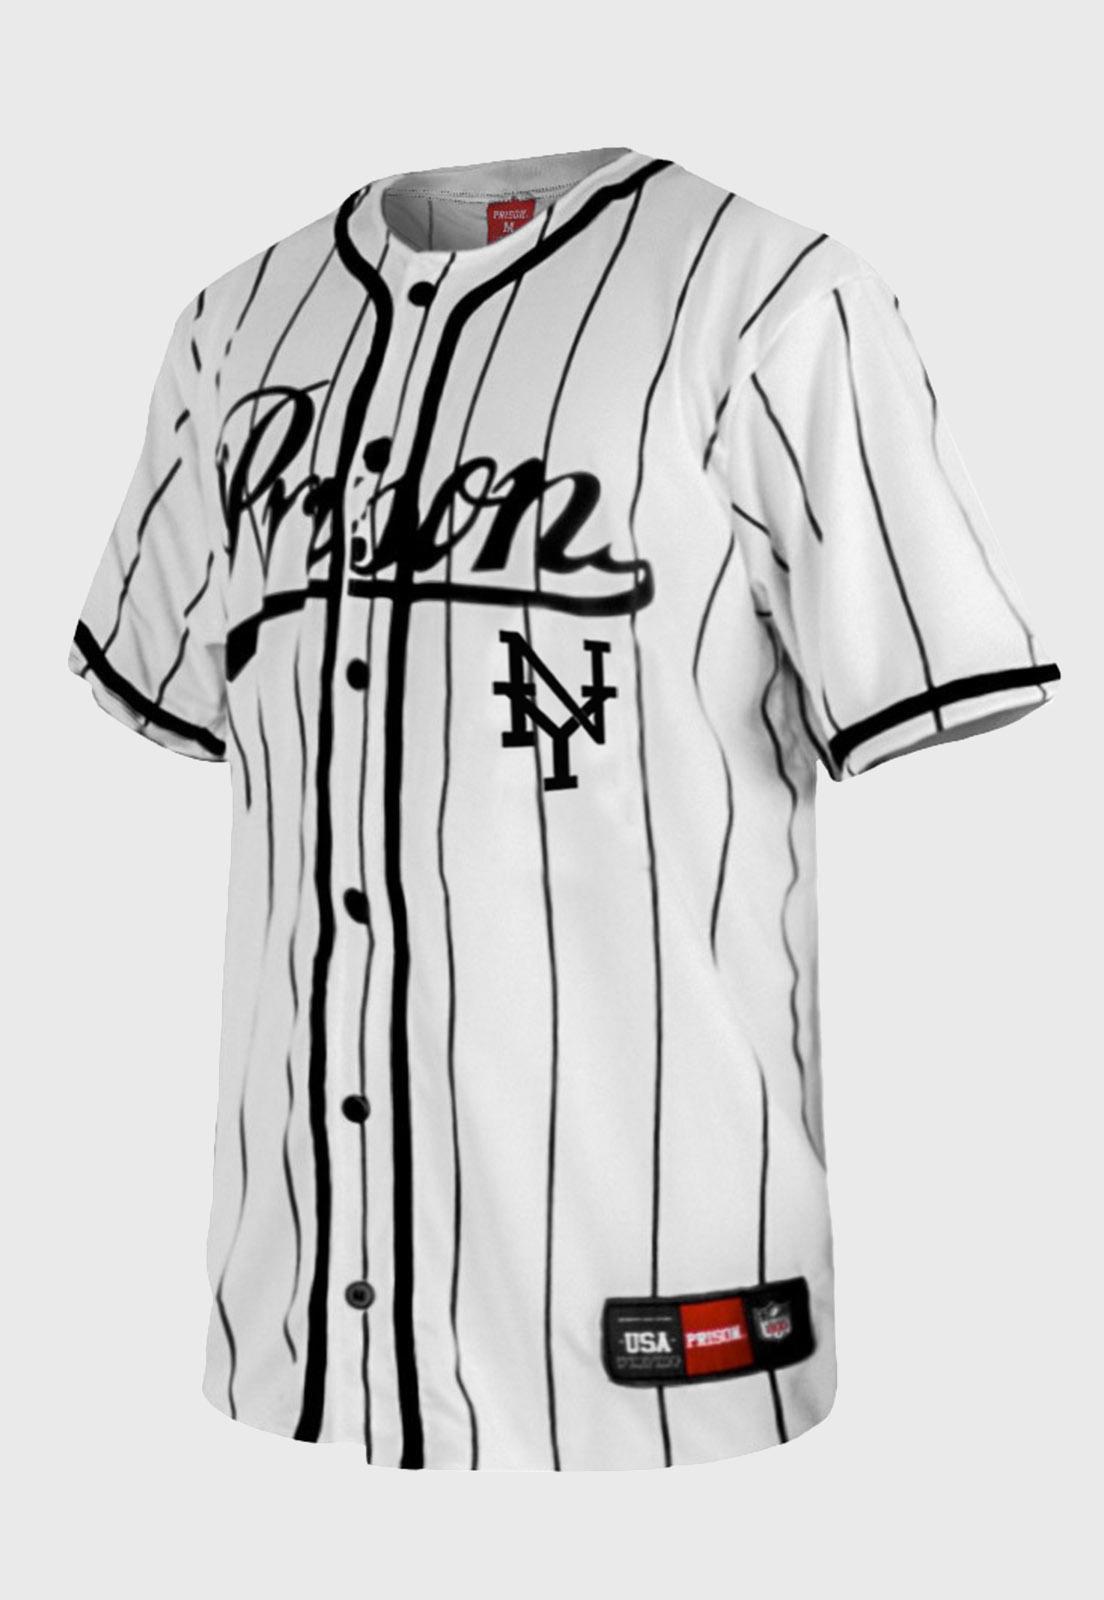 Camisa de Baseball Prison Streetwear  Listrada NY